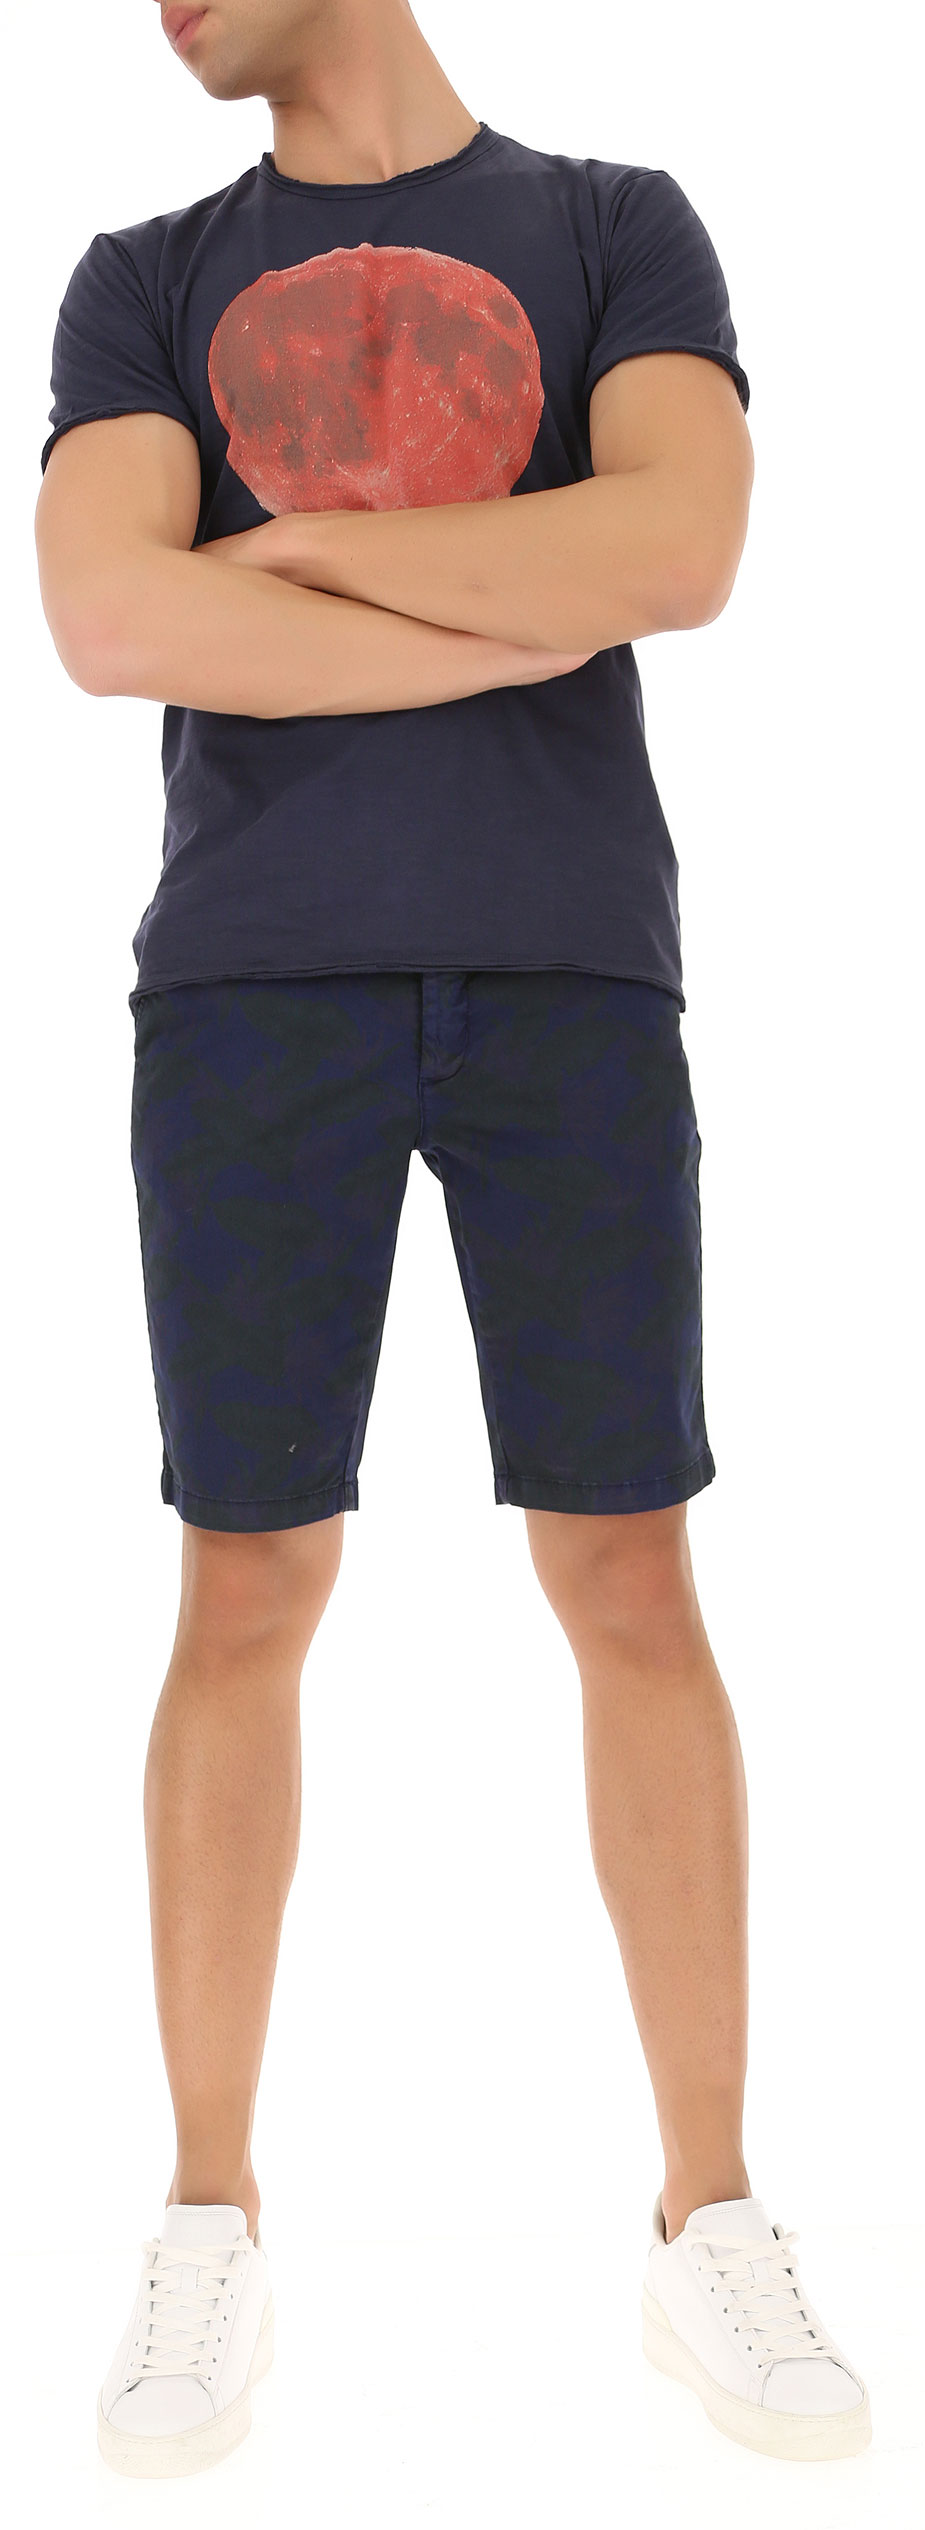 Codice Articolo Uomo Bomboogie bmjusttxfl Uomo 20 Abbigliamento Codice Bomboogie Abbigliamento 5x0YrwOYTq